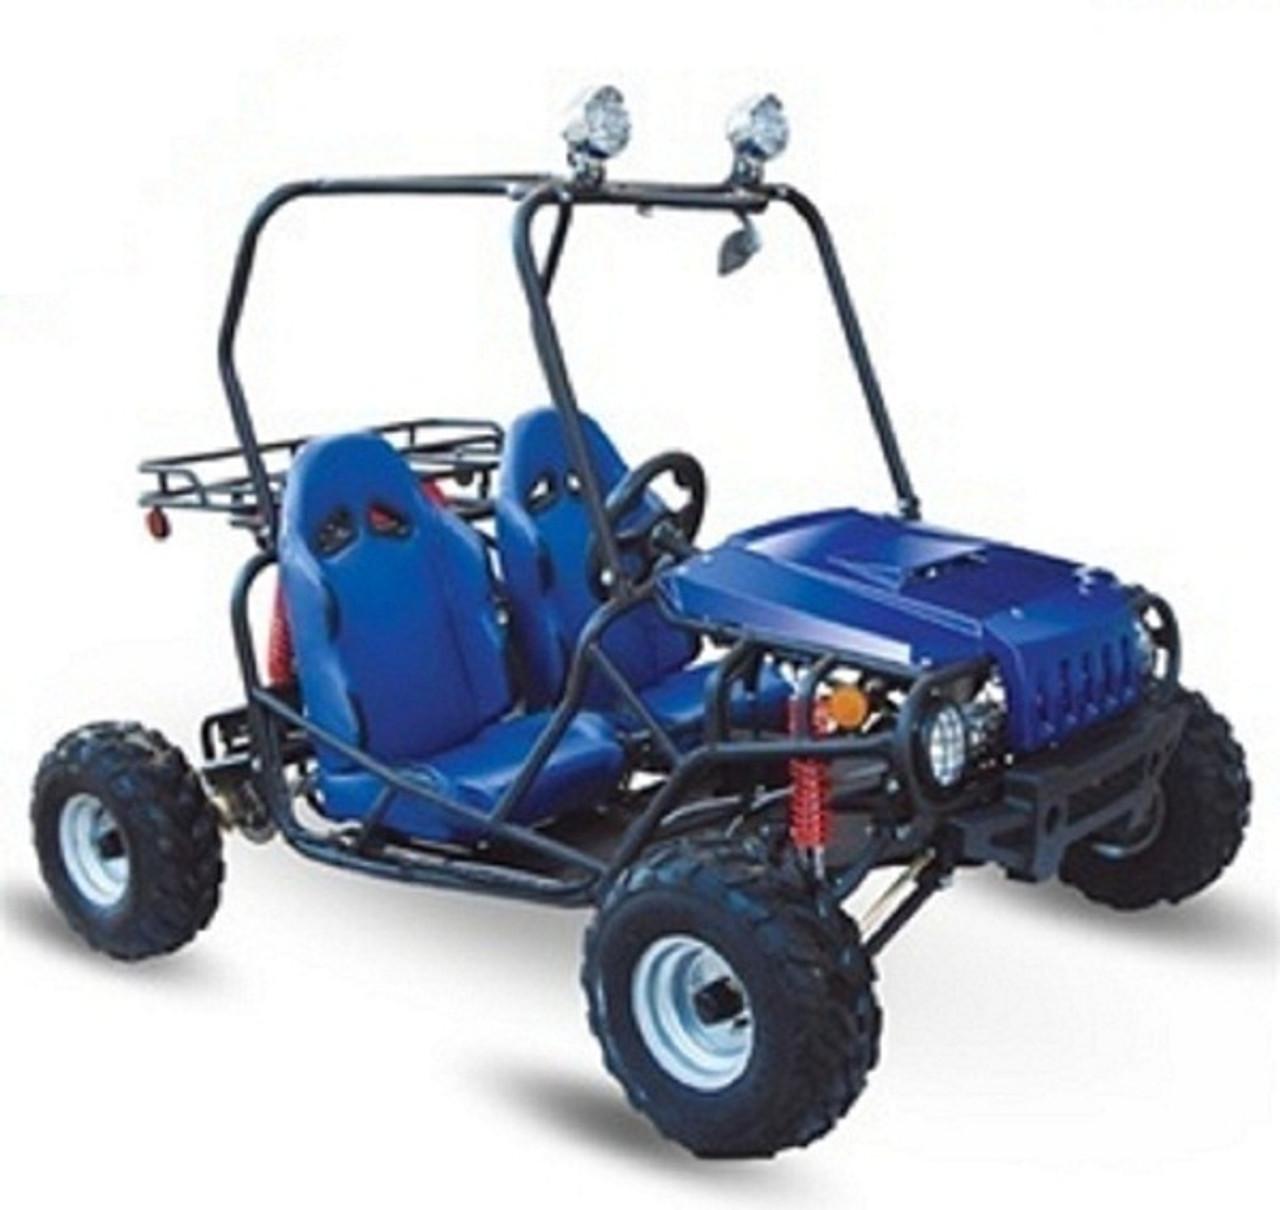 Taotao ATK125A 110CC, Air Cooled, 4-Stroke, 1-Cylinder Electric Start Go Kart